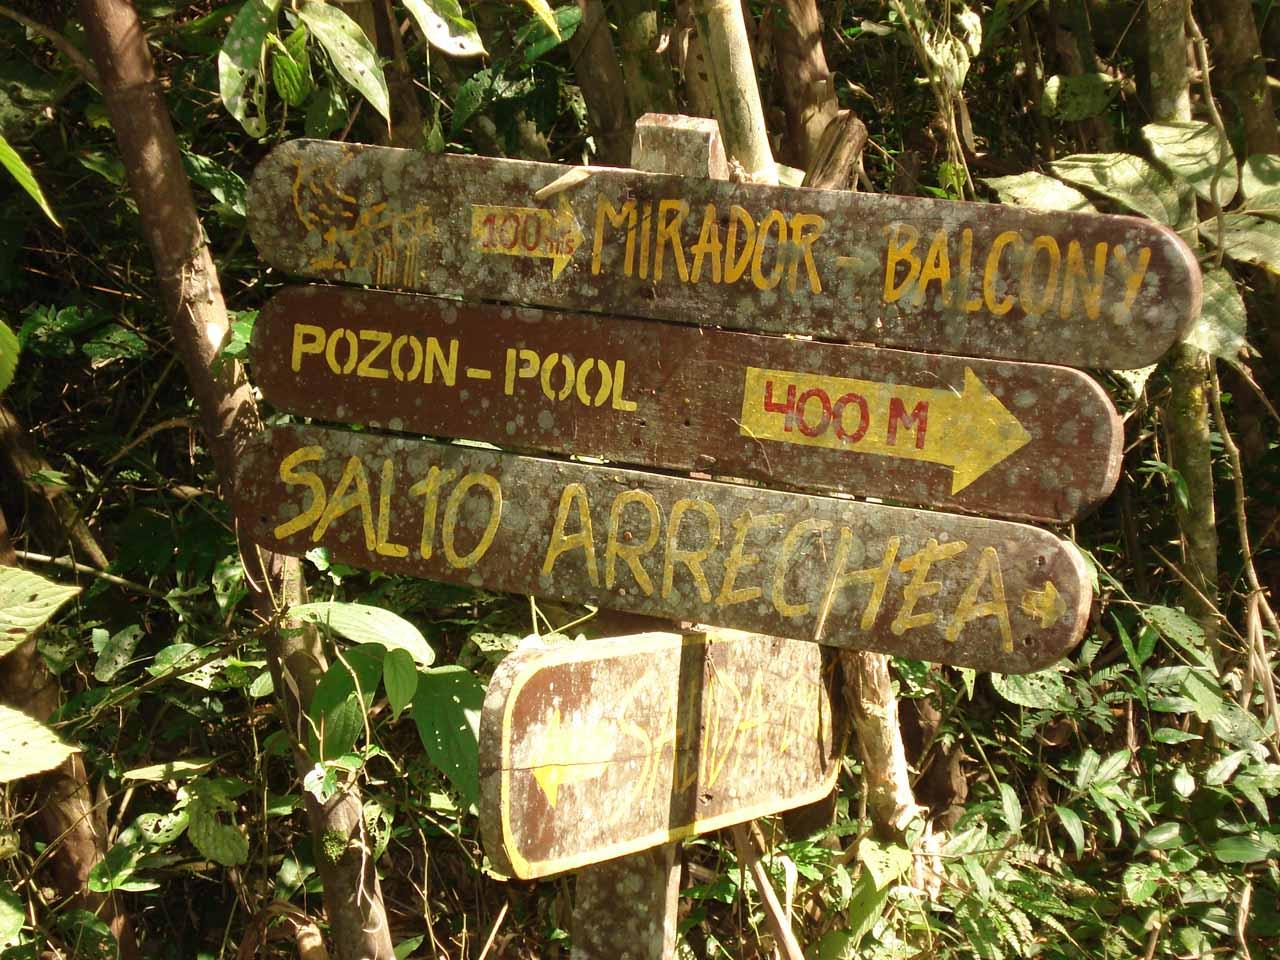 Sign pointing us towards Salto Arrechea